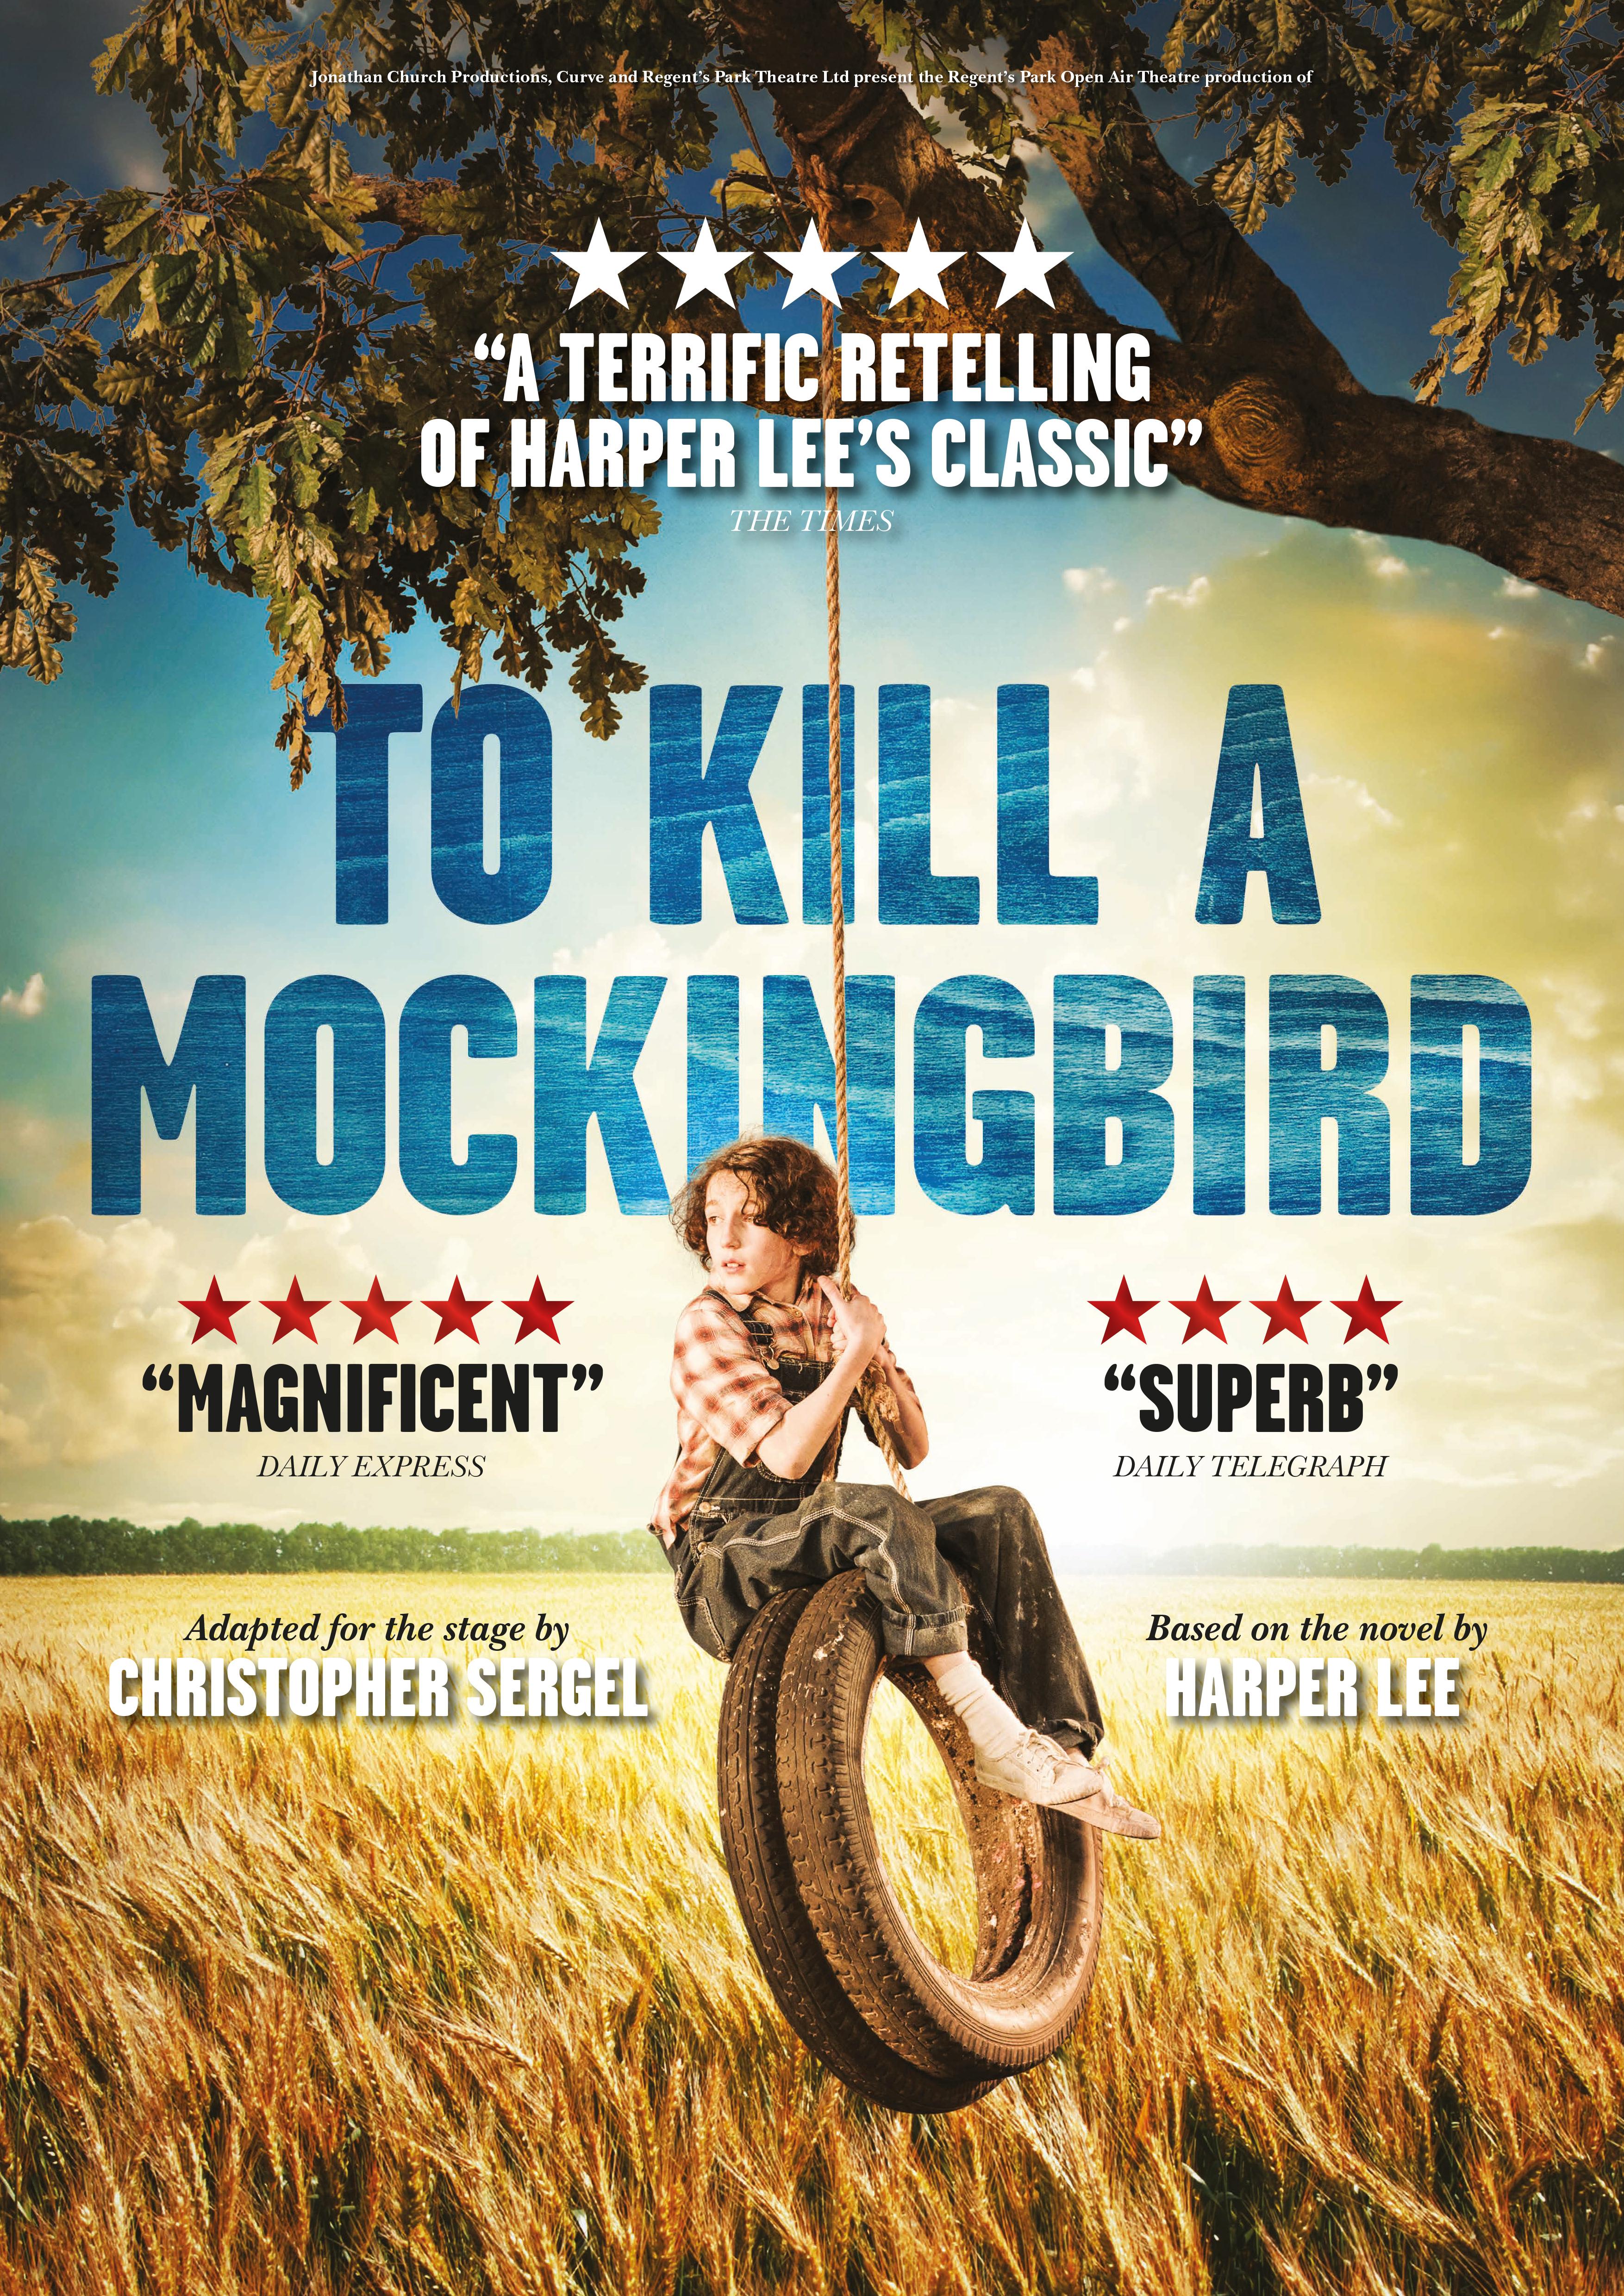 To Kill A Mockingbird Poster Show Image